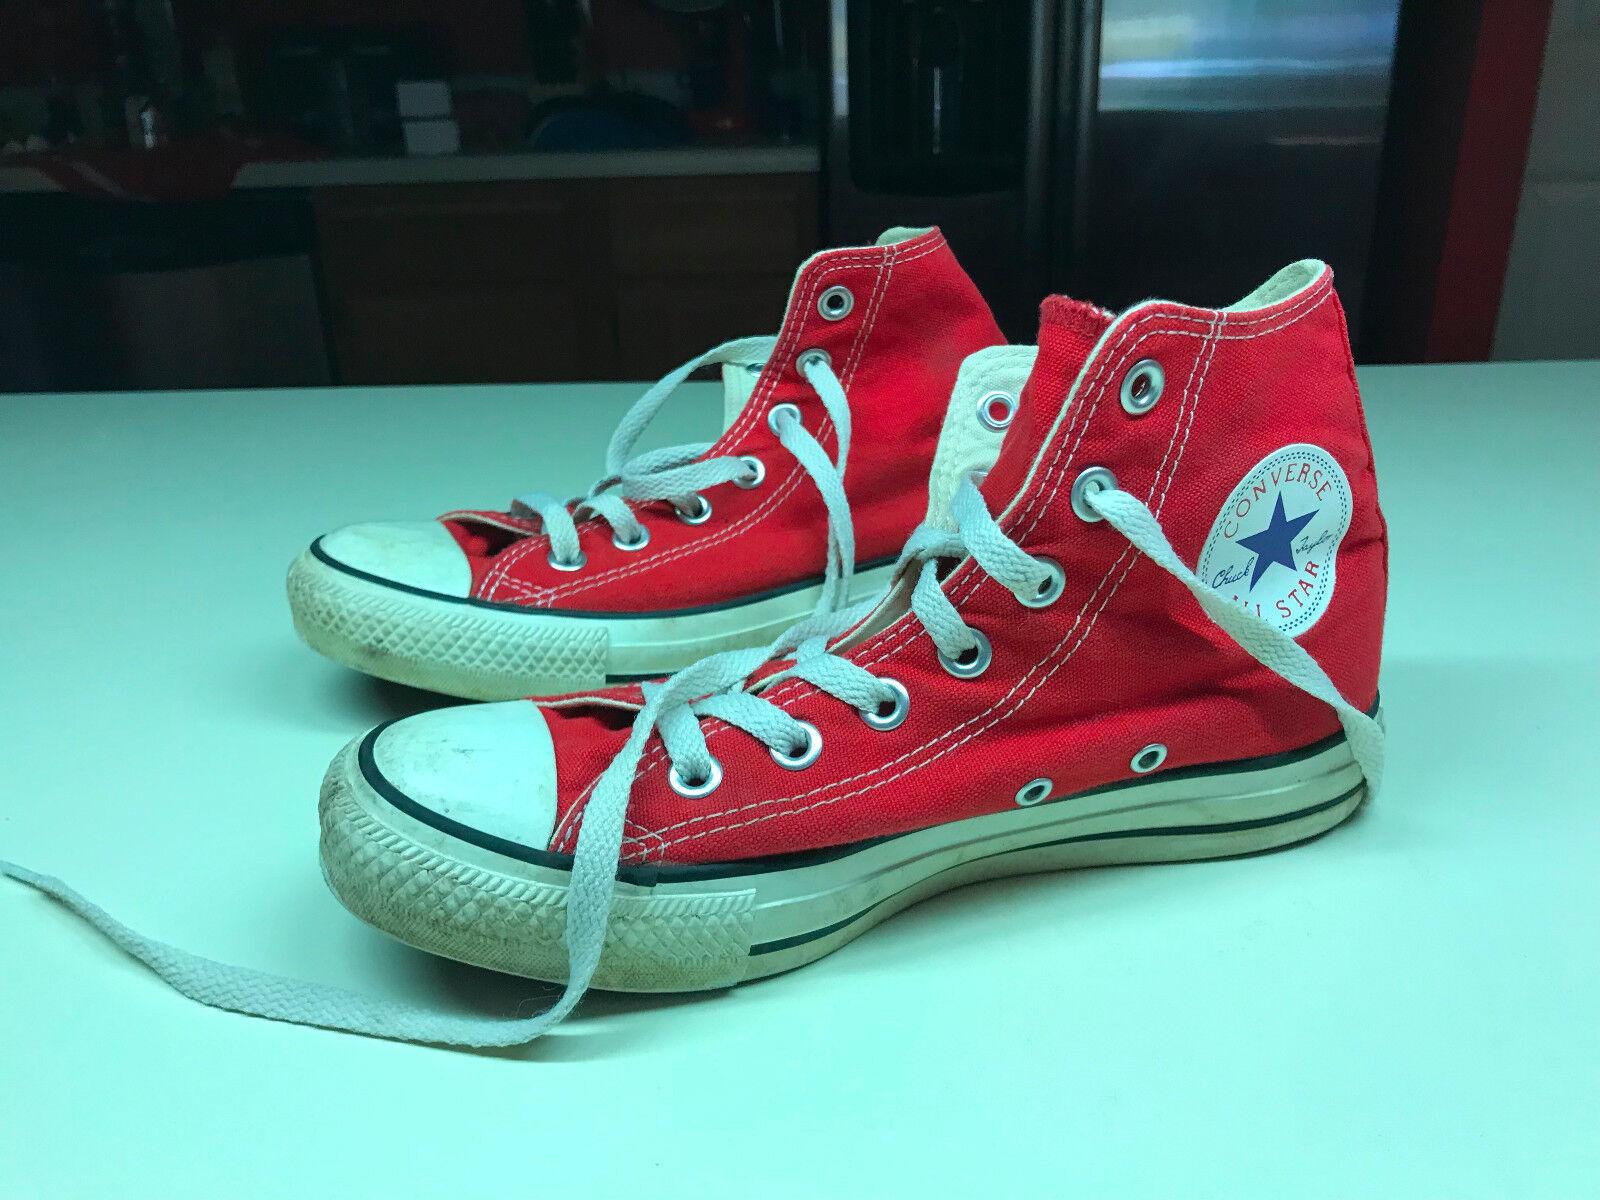 Die alten roten roten roten high - top converse all star nestlö chuck taylor turnschuhe männer größe 5 / 95 f6ccc3